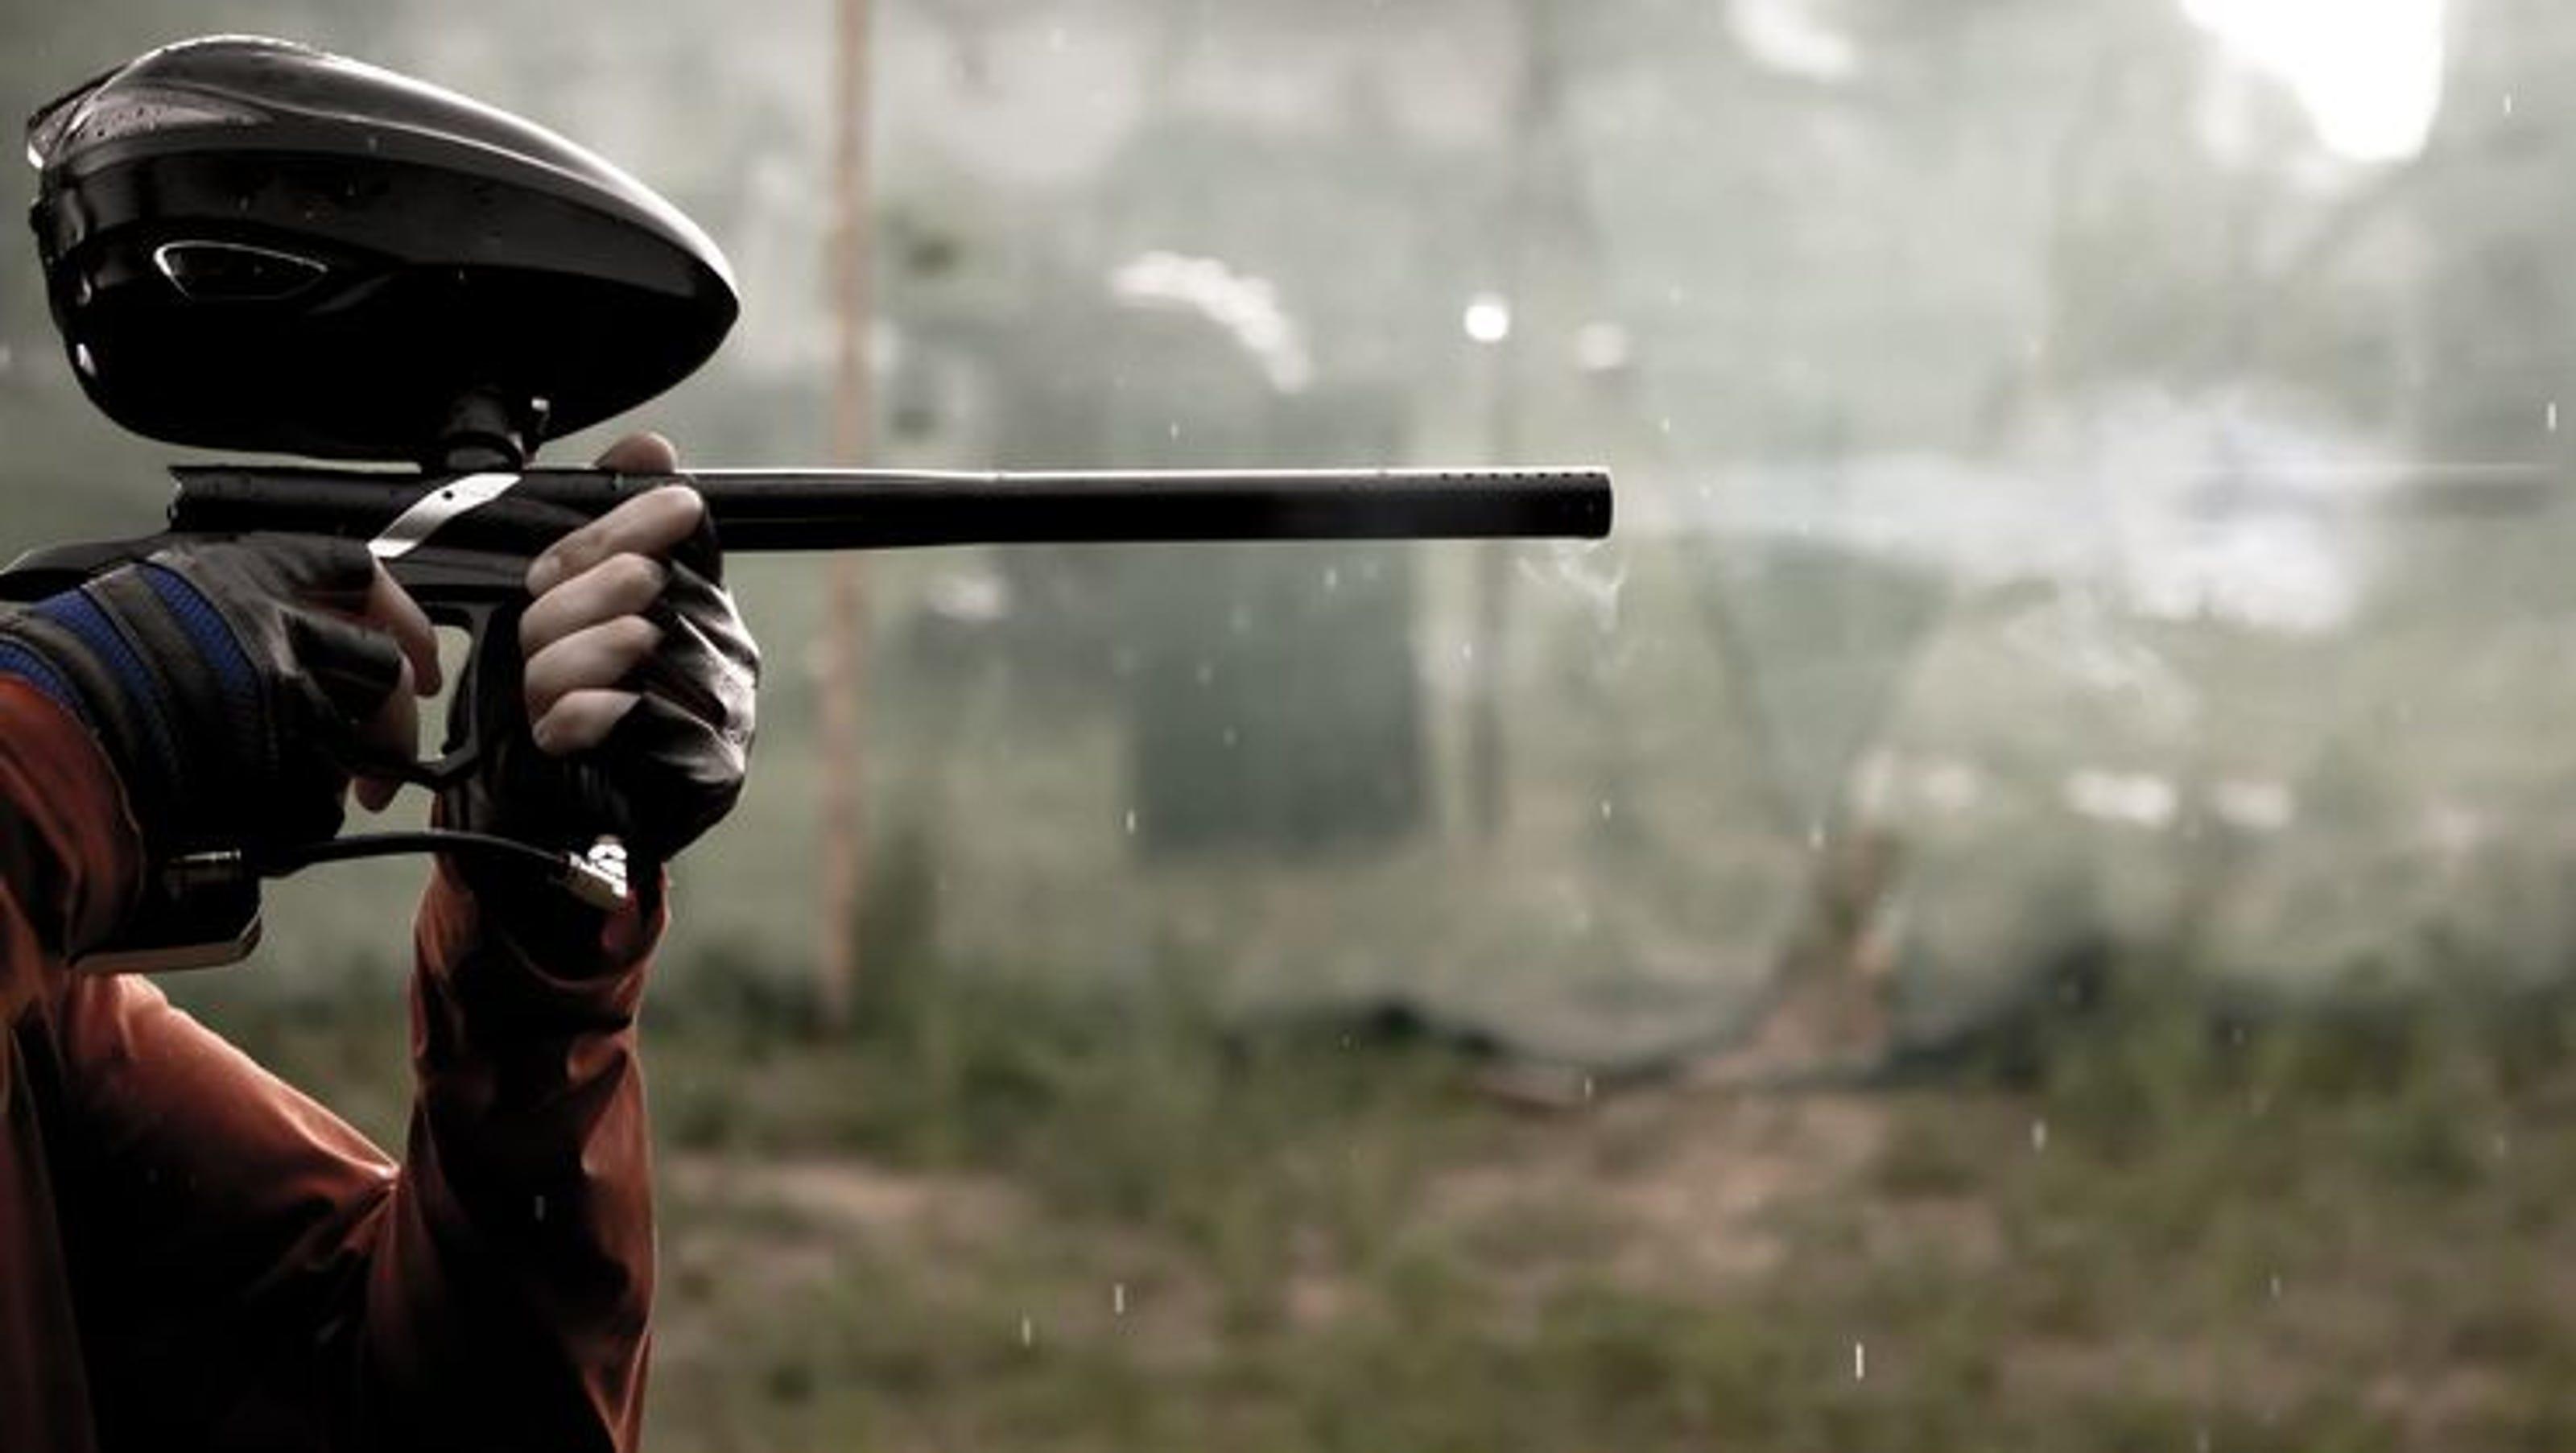 paintball guns ap news에 대한 이미지 검색결과